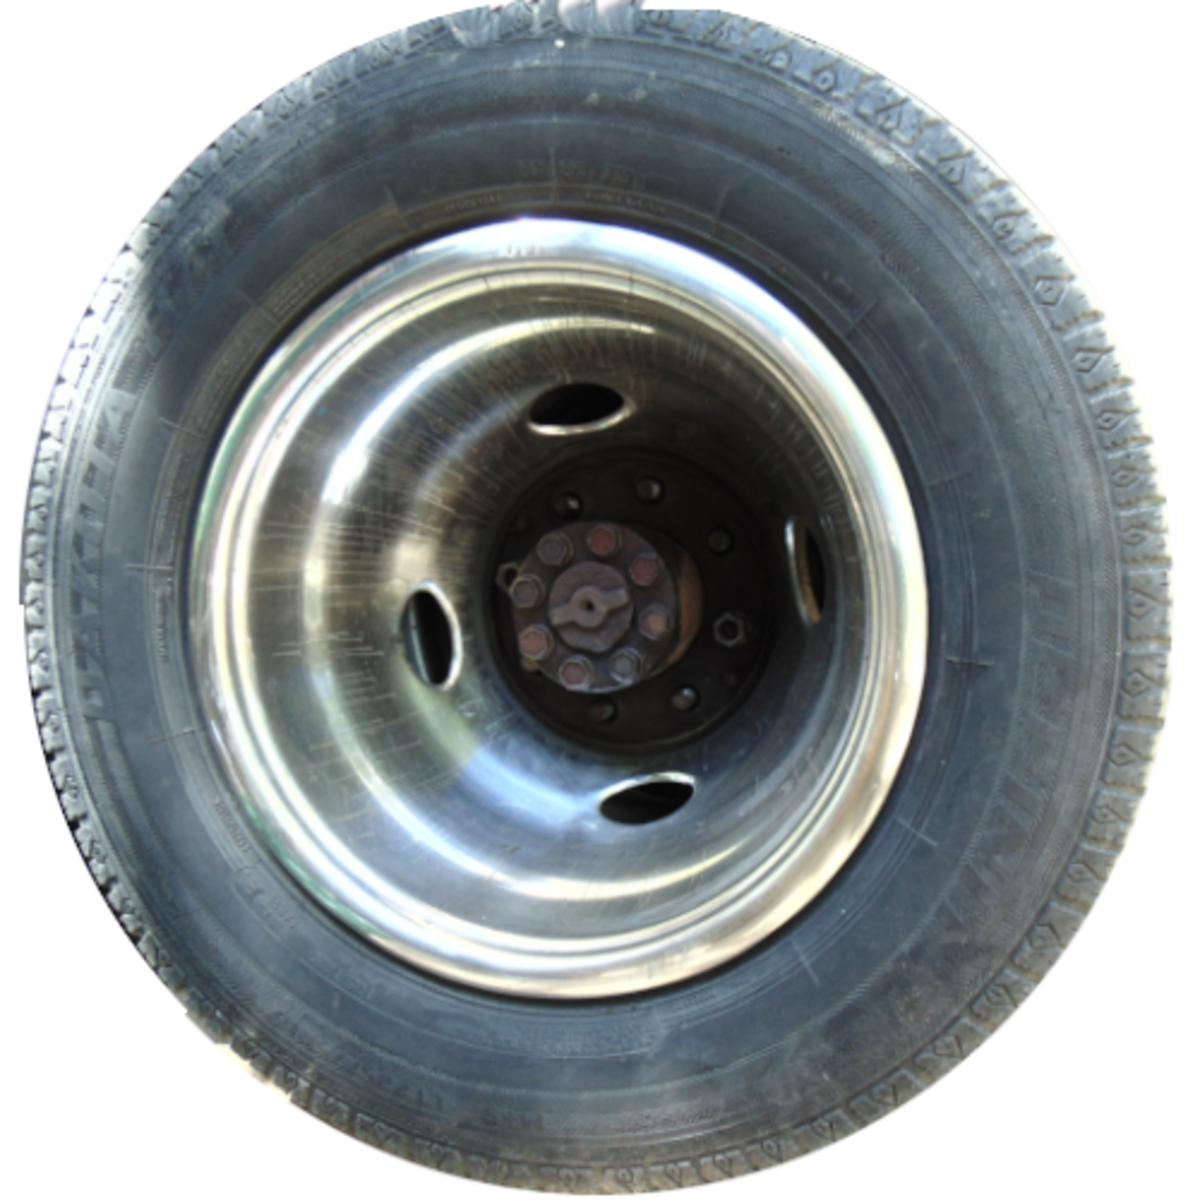 Streaks of brake fluid on rim